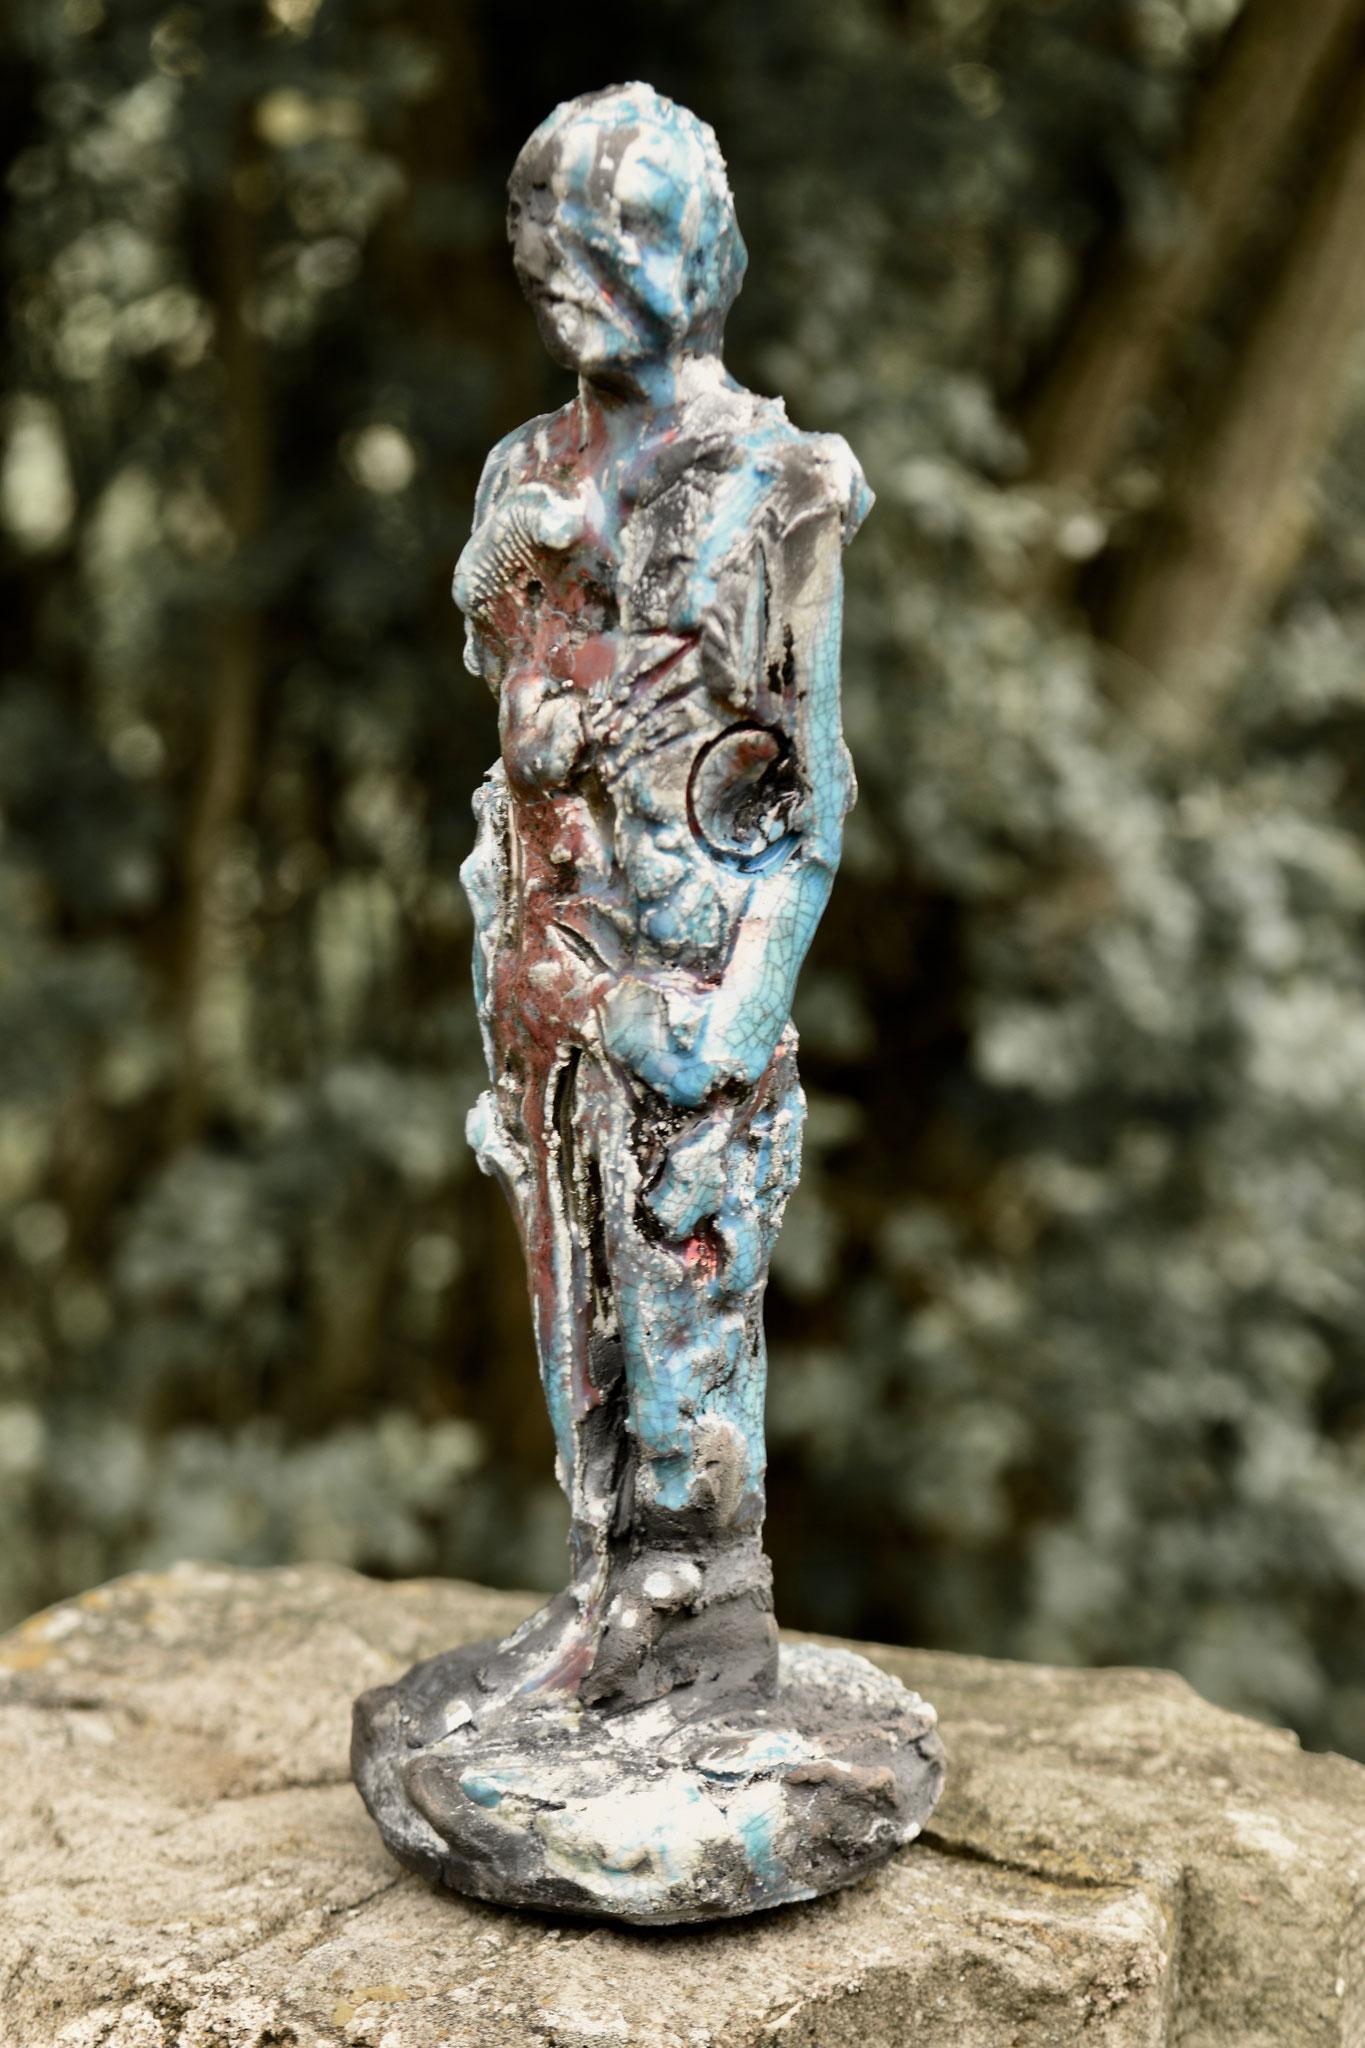 25  |  Figur  |  2019  |  Keramik Raku  |  33 cm